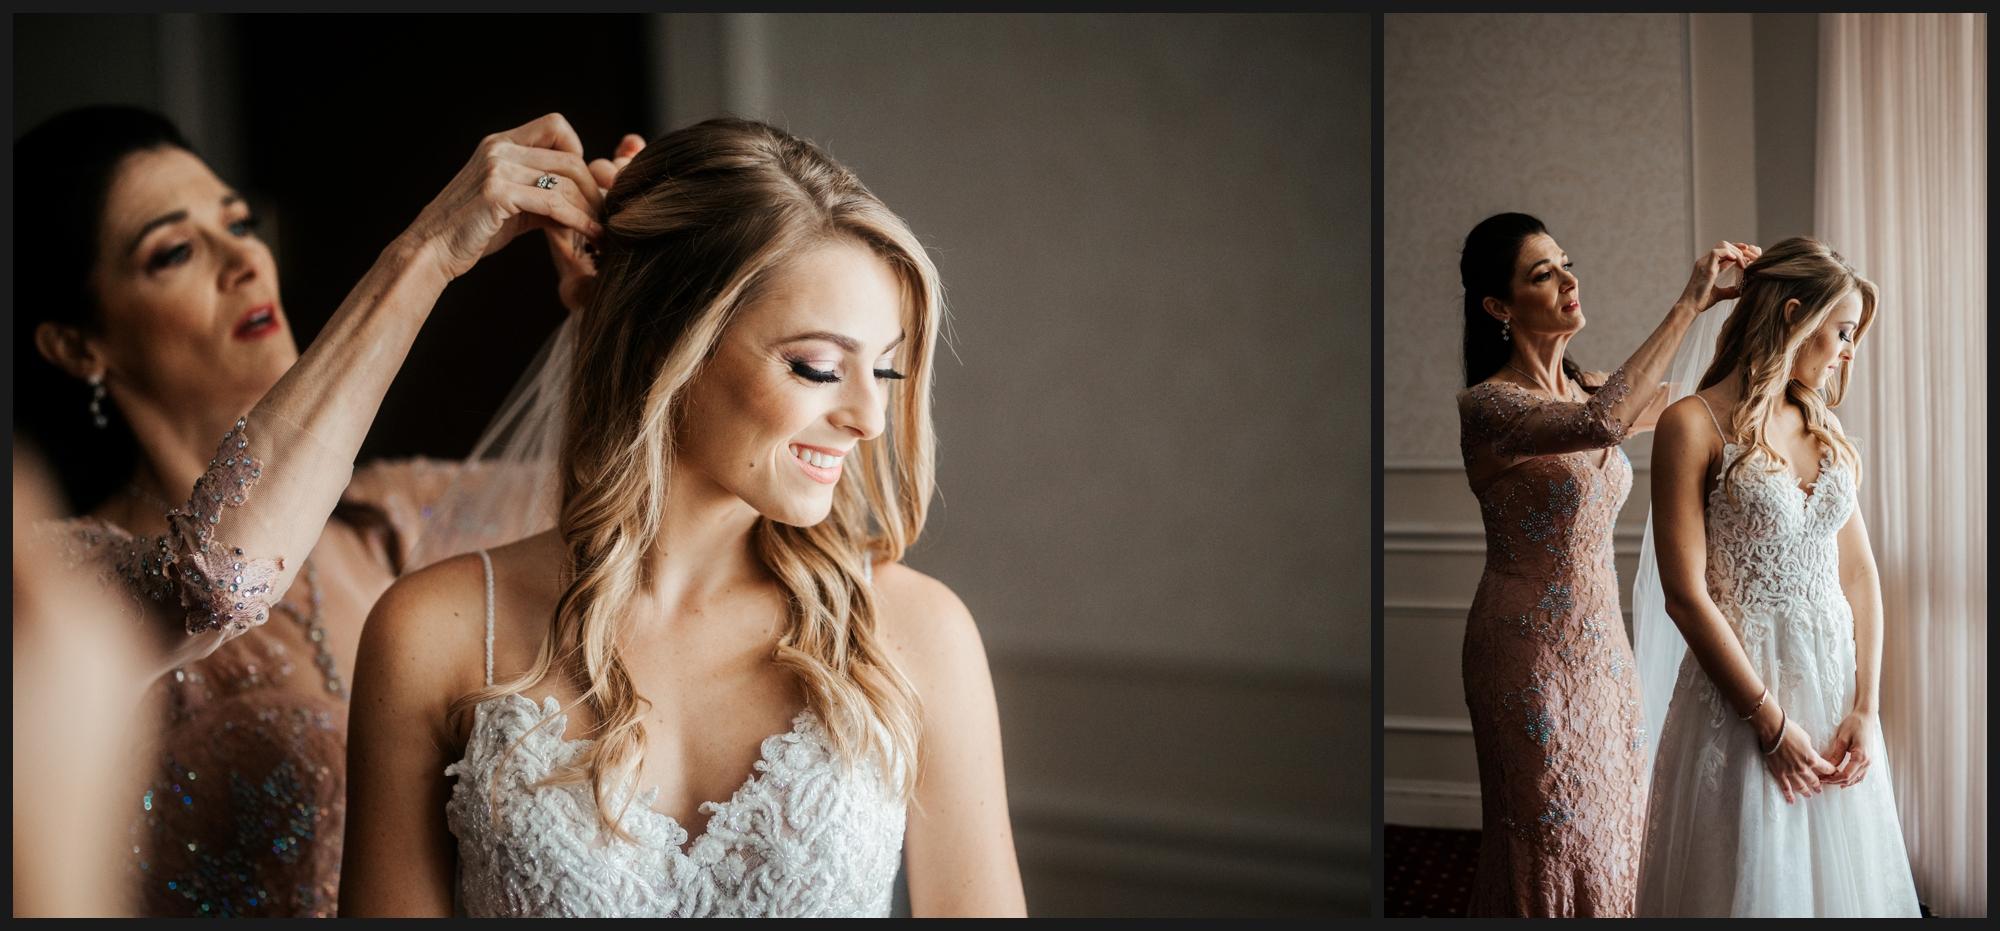 Orlando-Wedding-Photographer-destination-wedding-photographer-florida-wedding-photographer-bohemian-wedding-photographer_0007.jpg